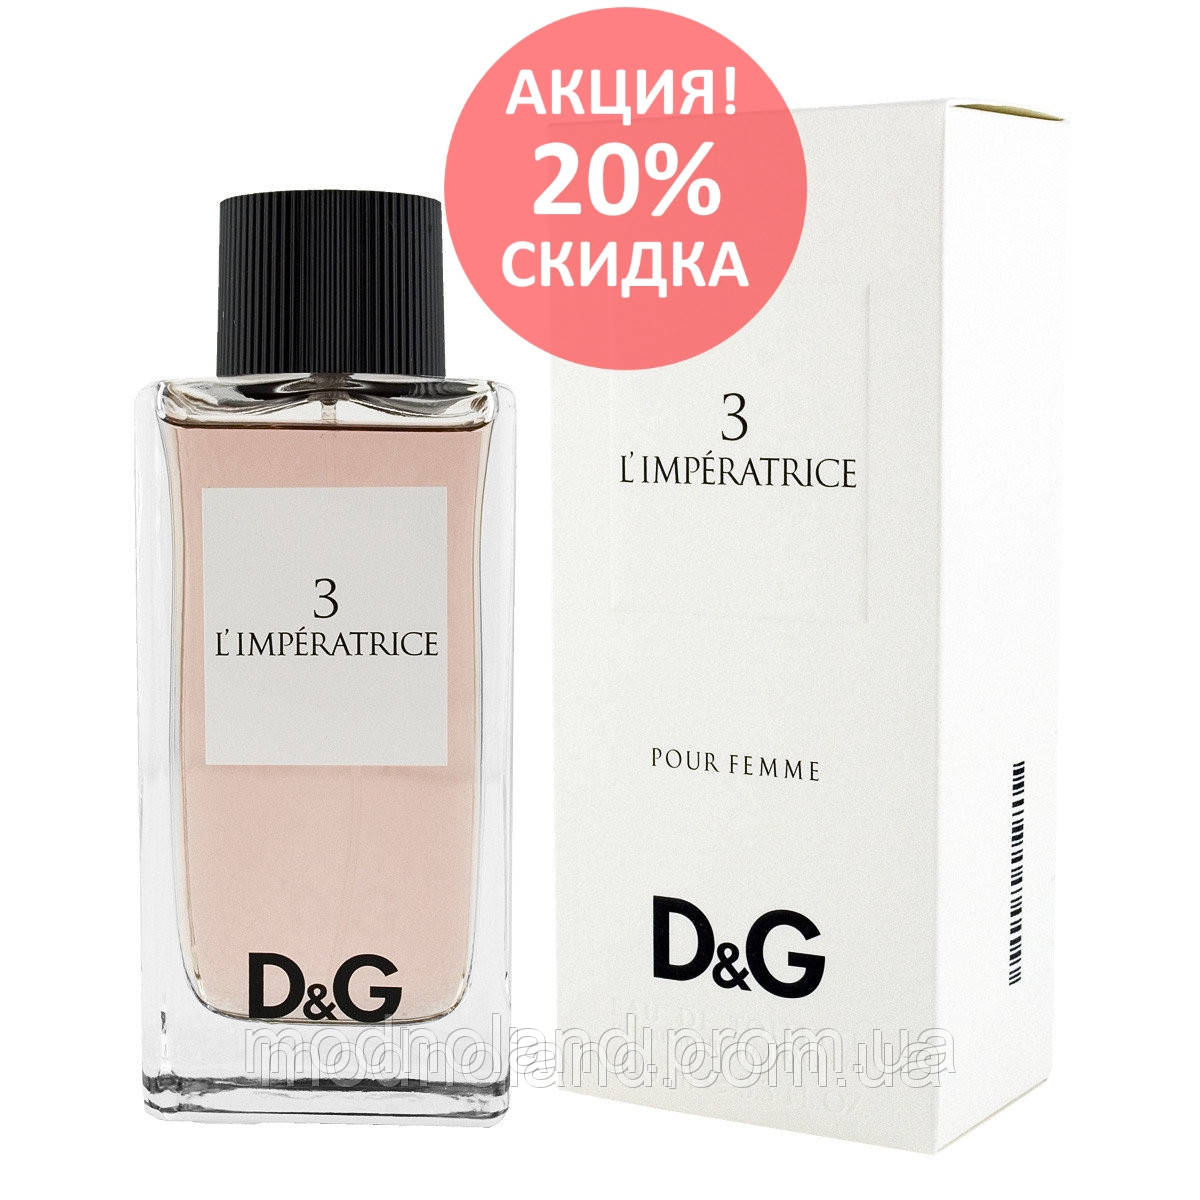 Женская туалетная вода Dolce   Gabbana 3 L Imperatrice 100 ml (Дольче  Габбана 3 0cb1e55e89ef6